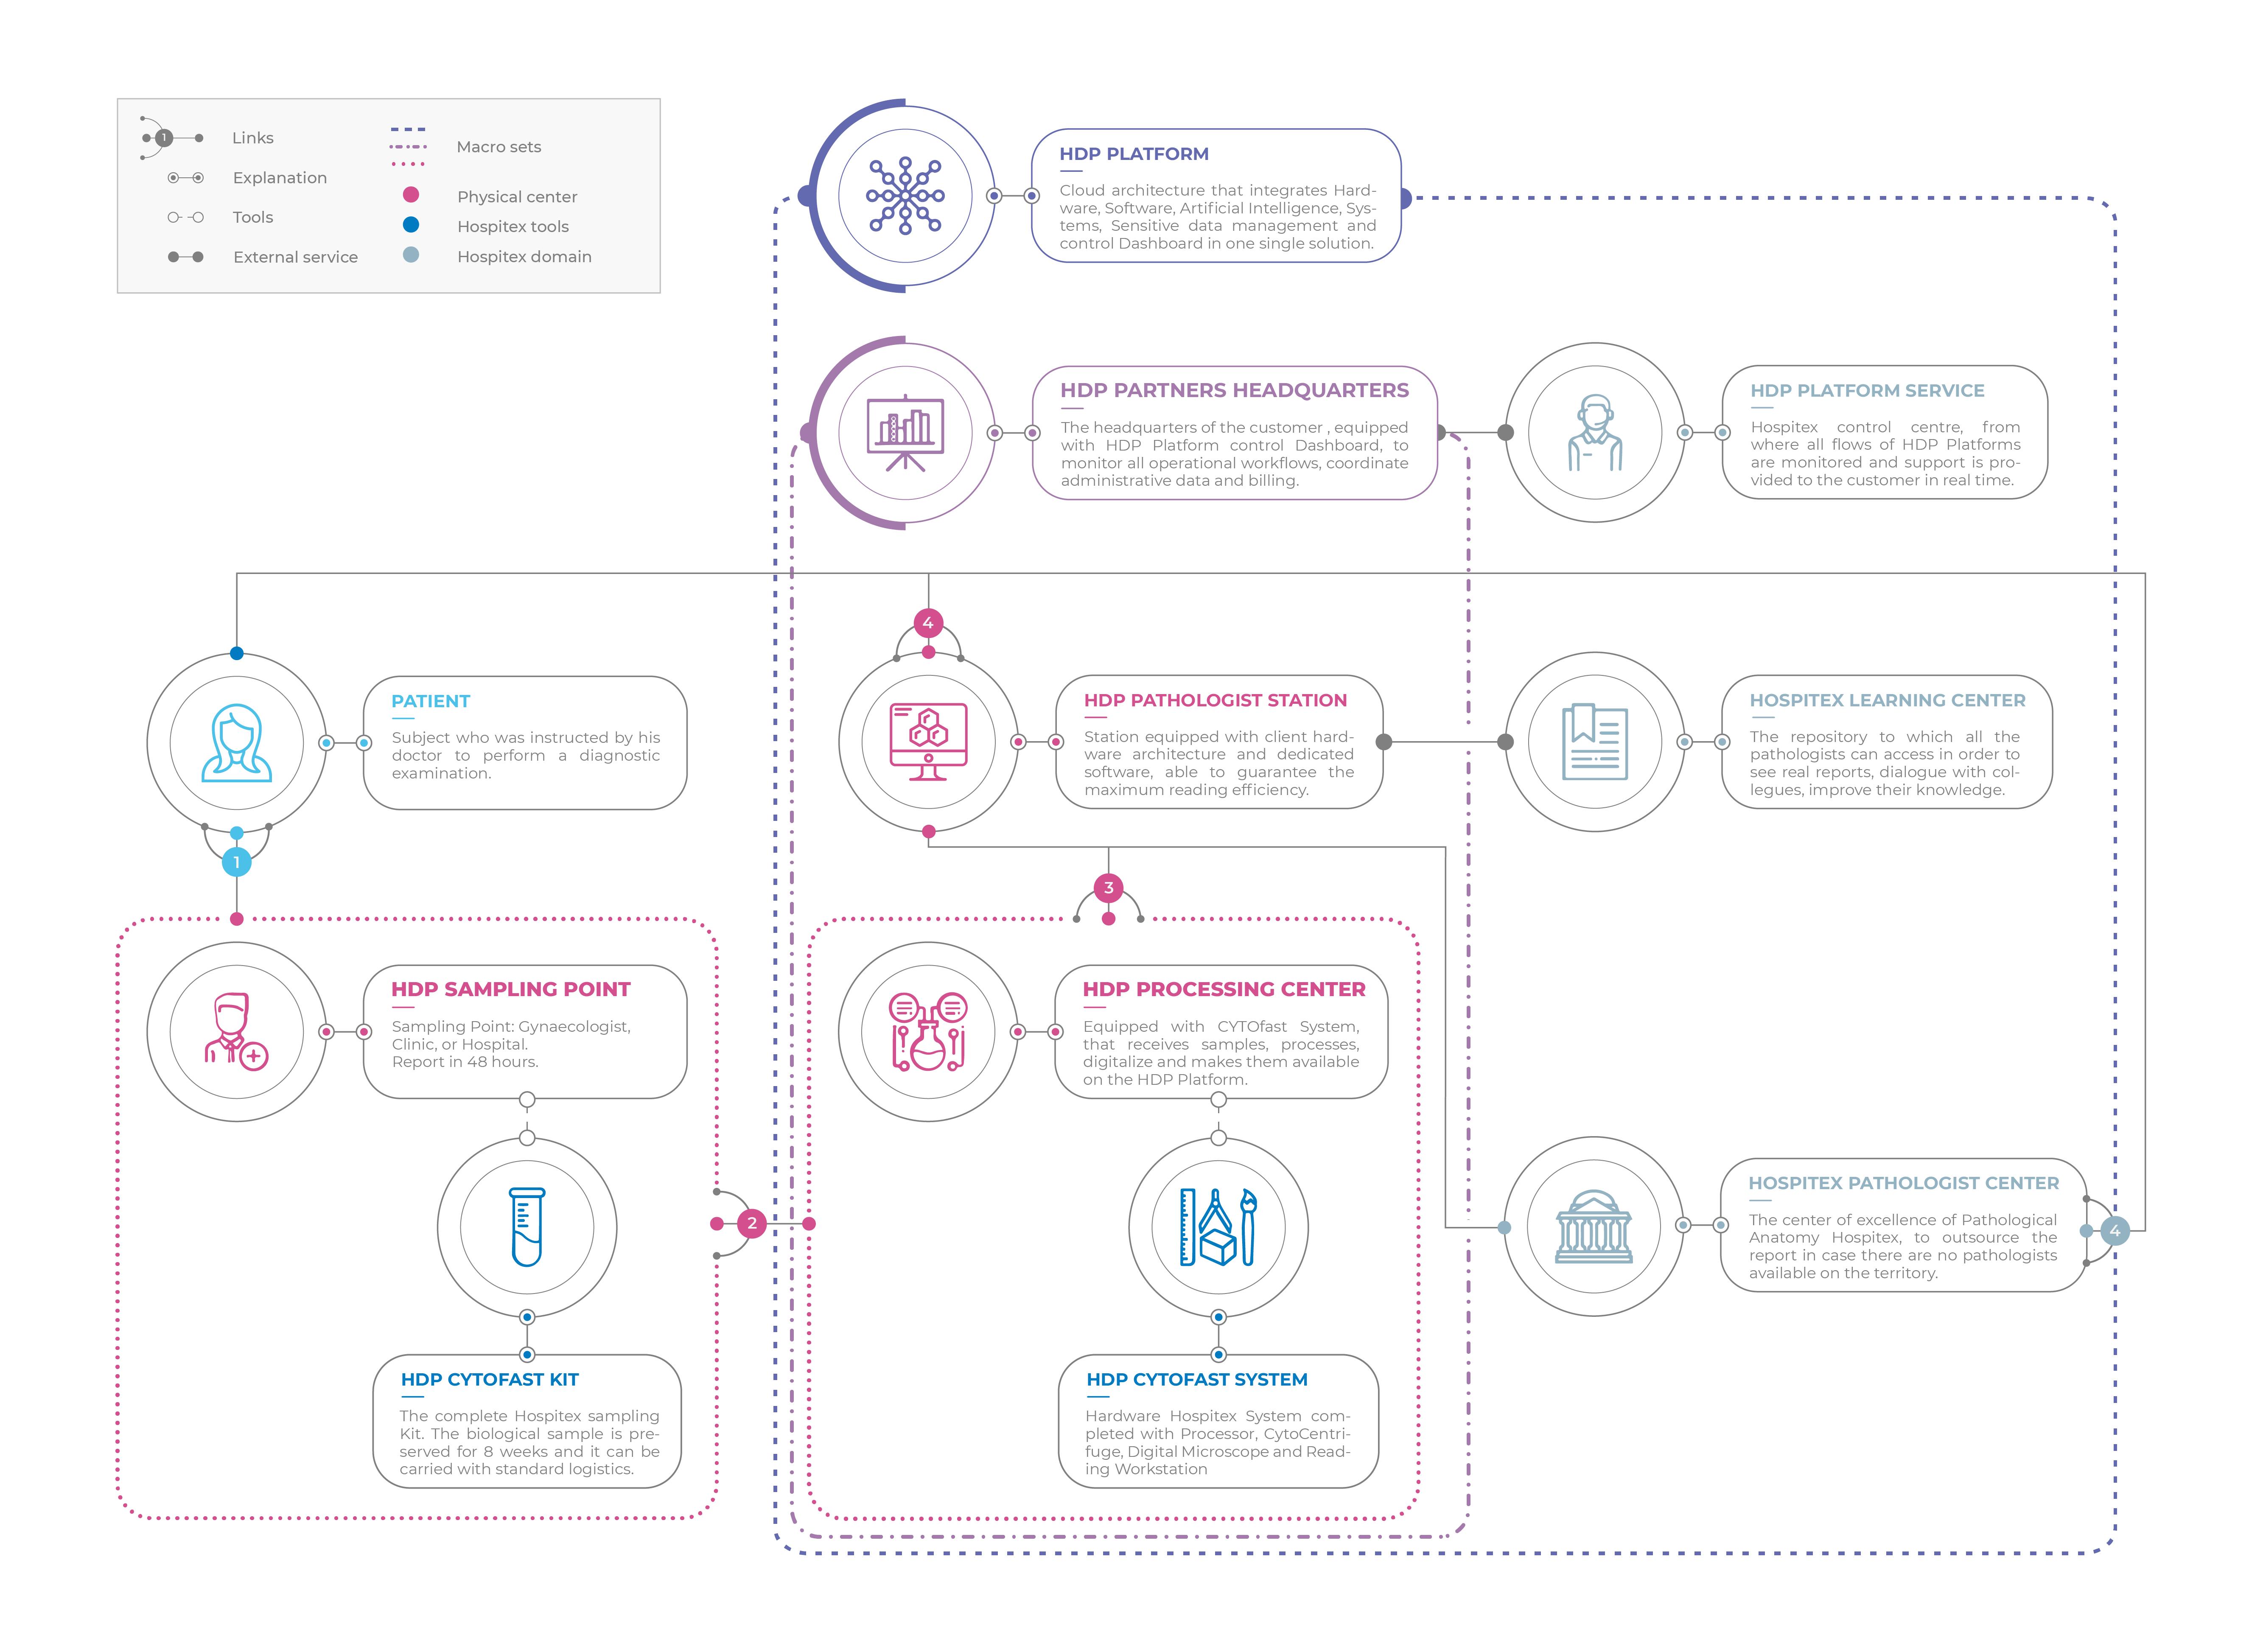 https://www.hospitex.com/wp-content/uploads/2021/06/Infografica-Digital-Pathology_English.png